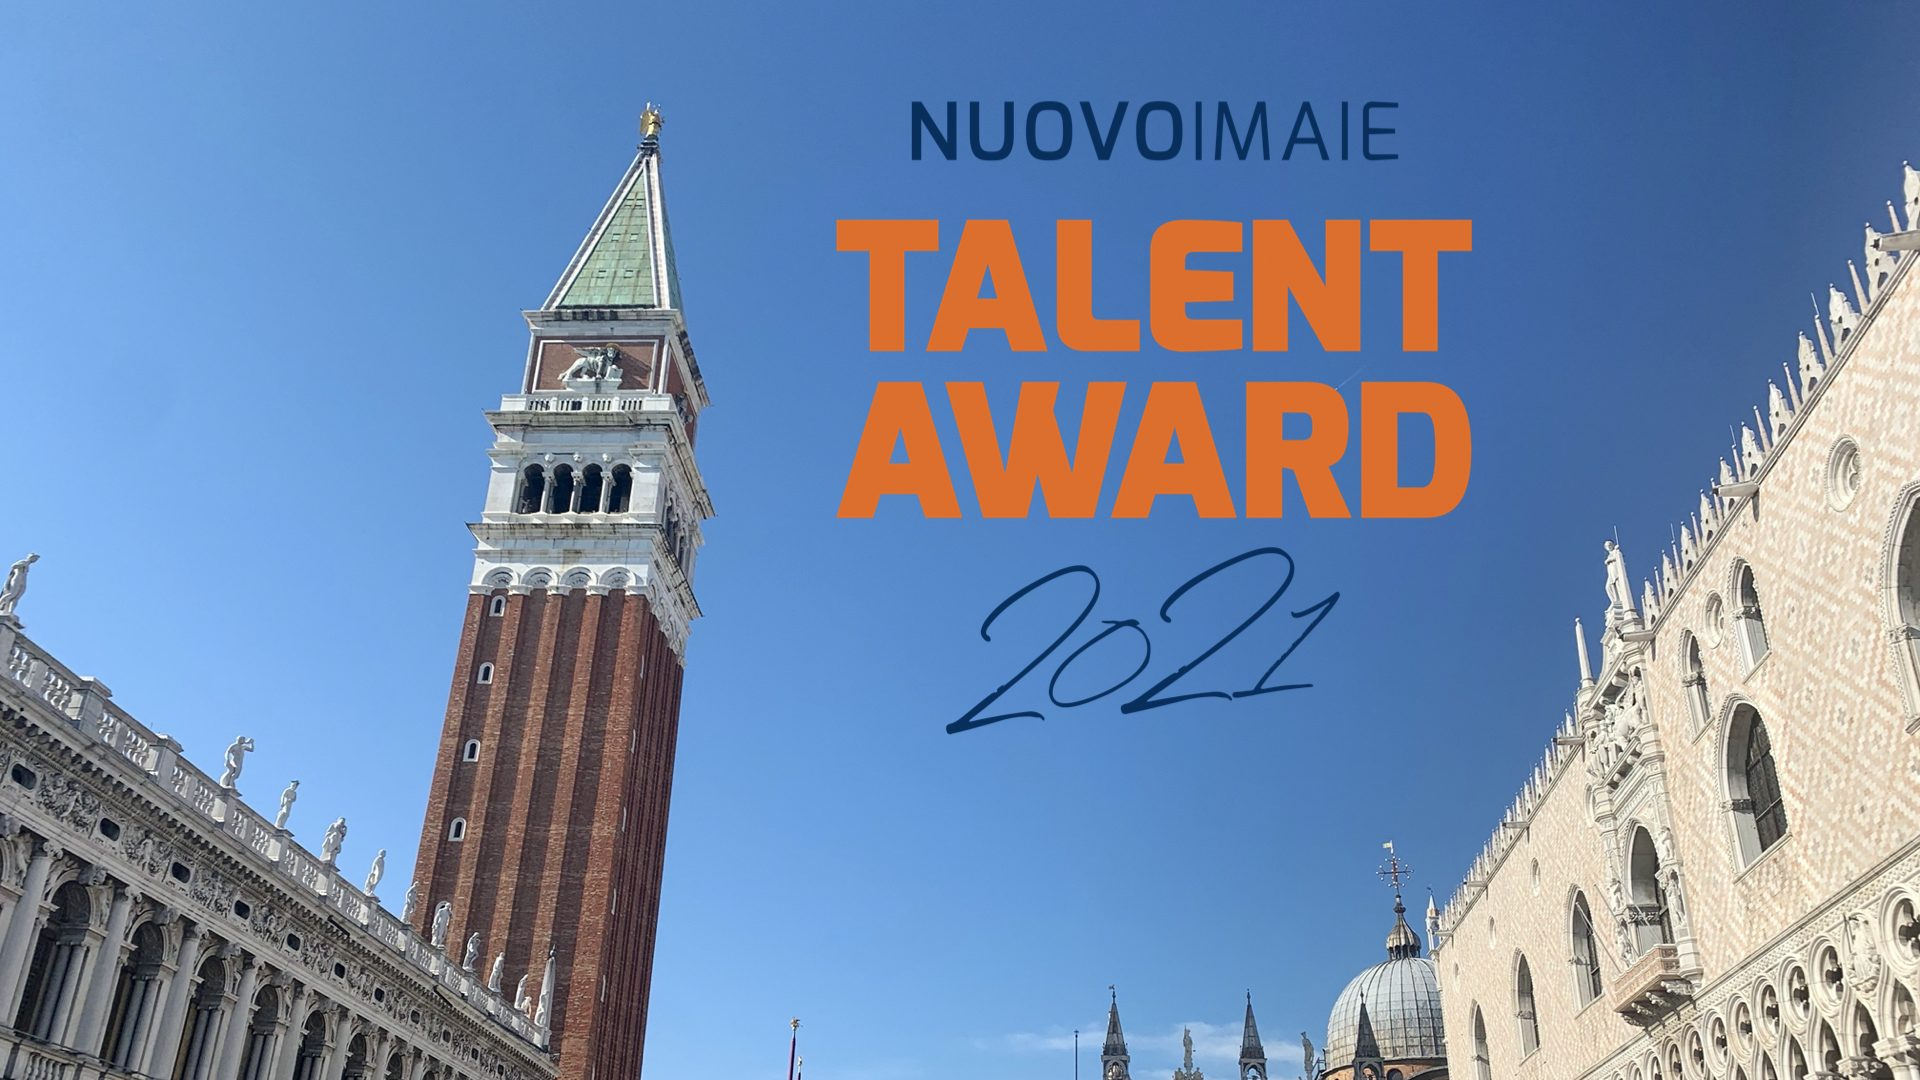 NUOVO IMAIE Talent Award 2021: il videoreportage